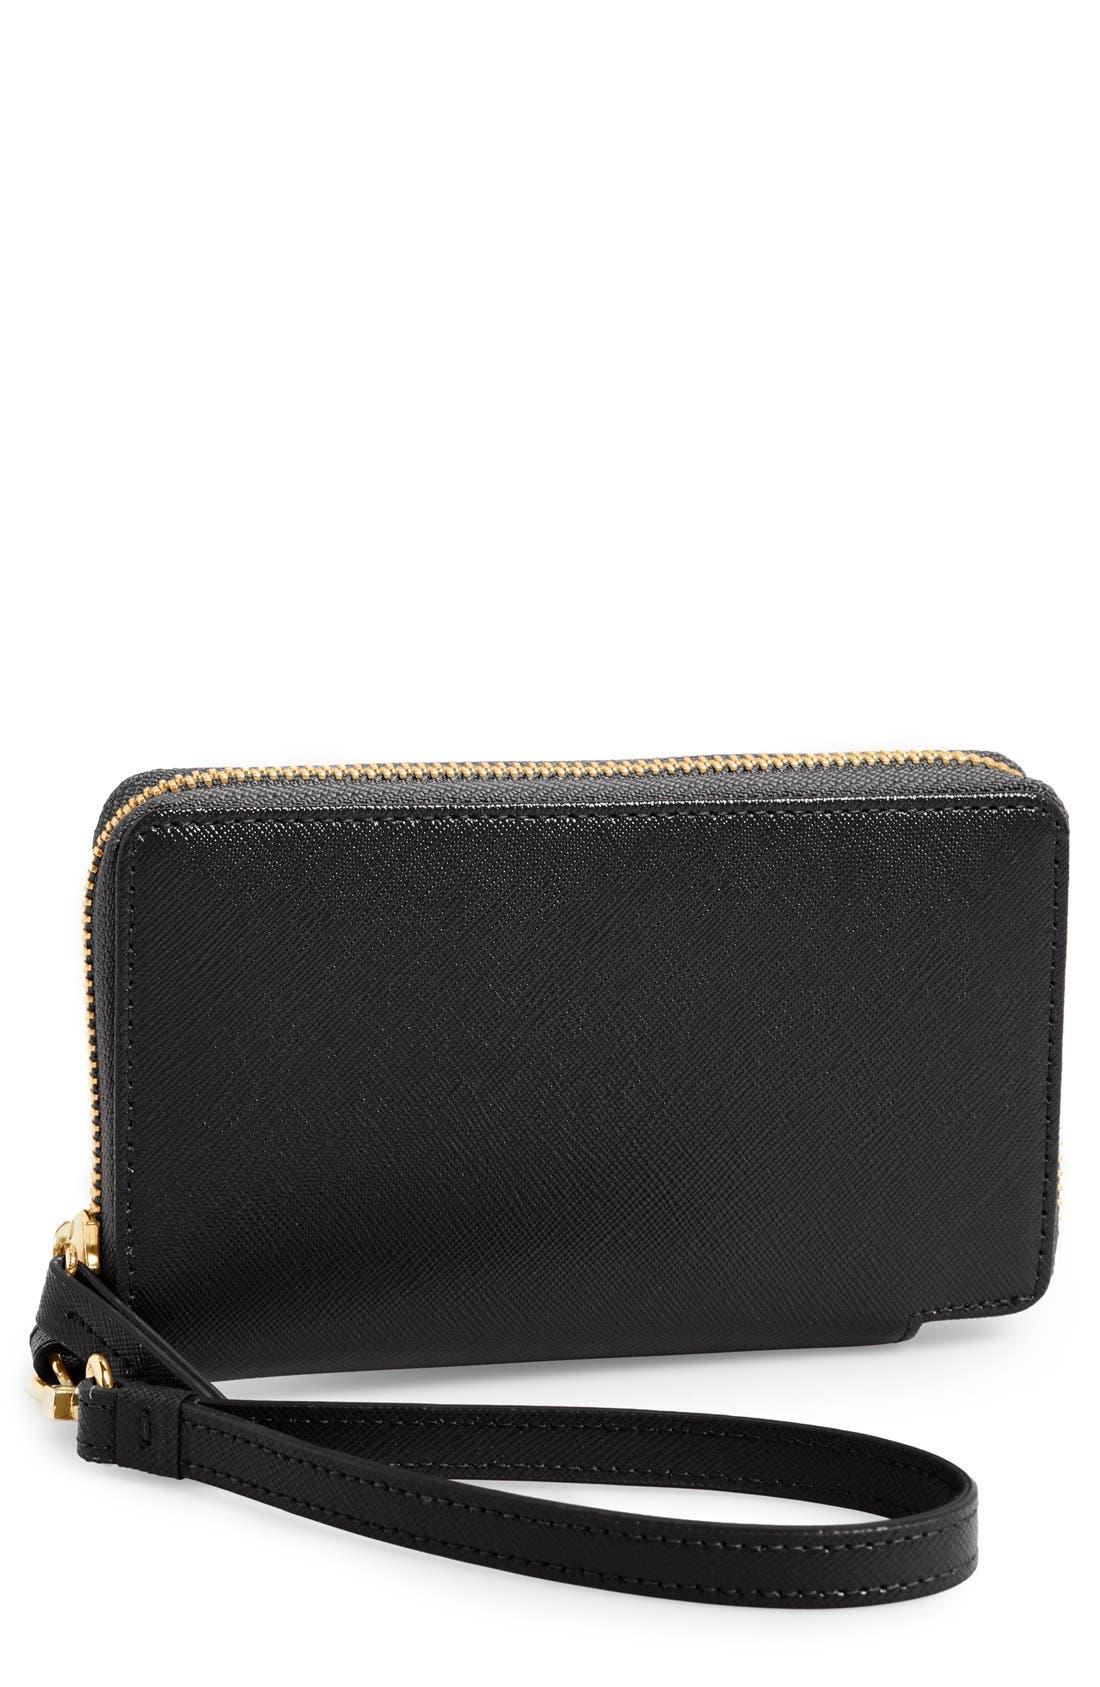 Alternate Image 1 Selected - Halogen® 'Cassie' Saffiano Leather Zip Around Wallet